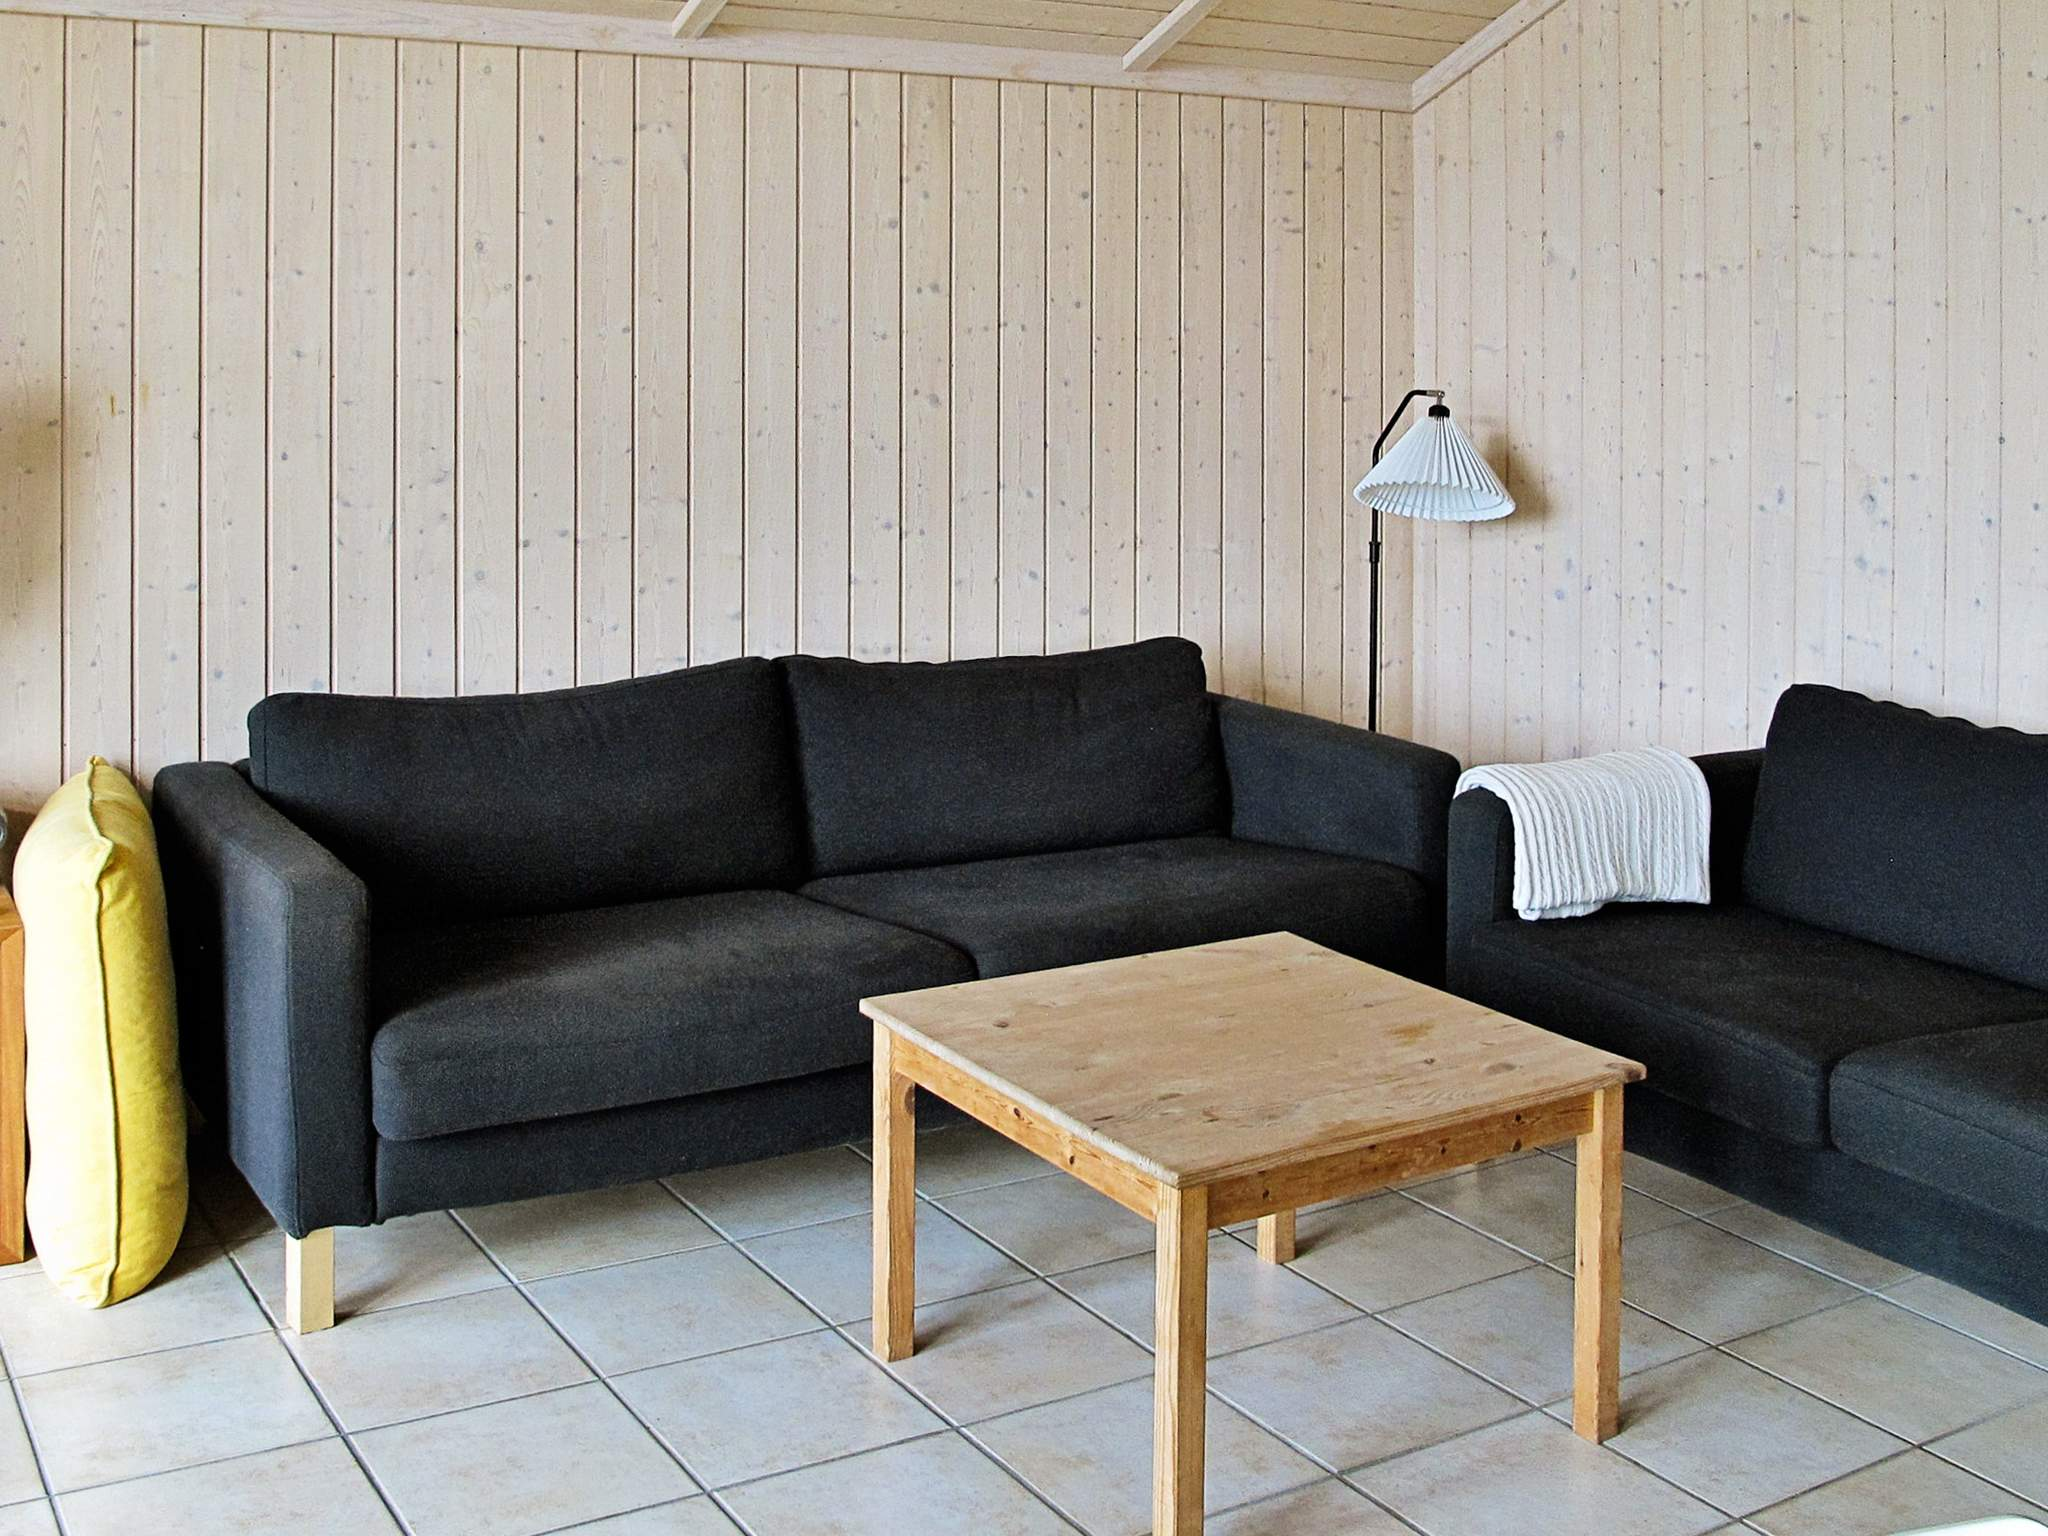 Ferienhaus Ore Strand (300650), Oreby, , Südseeland, Dänemark, Bild 2